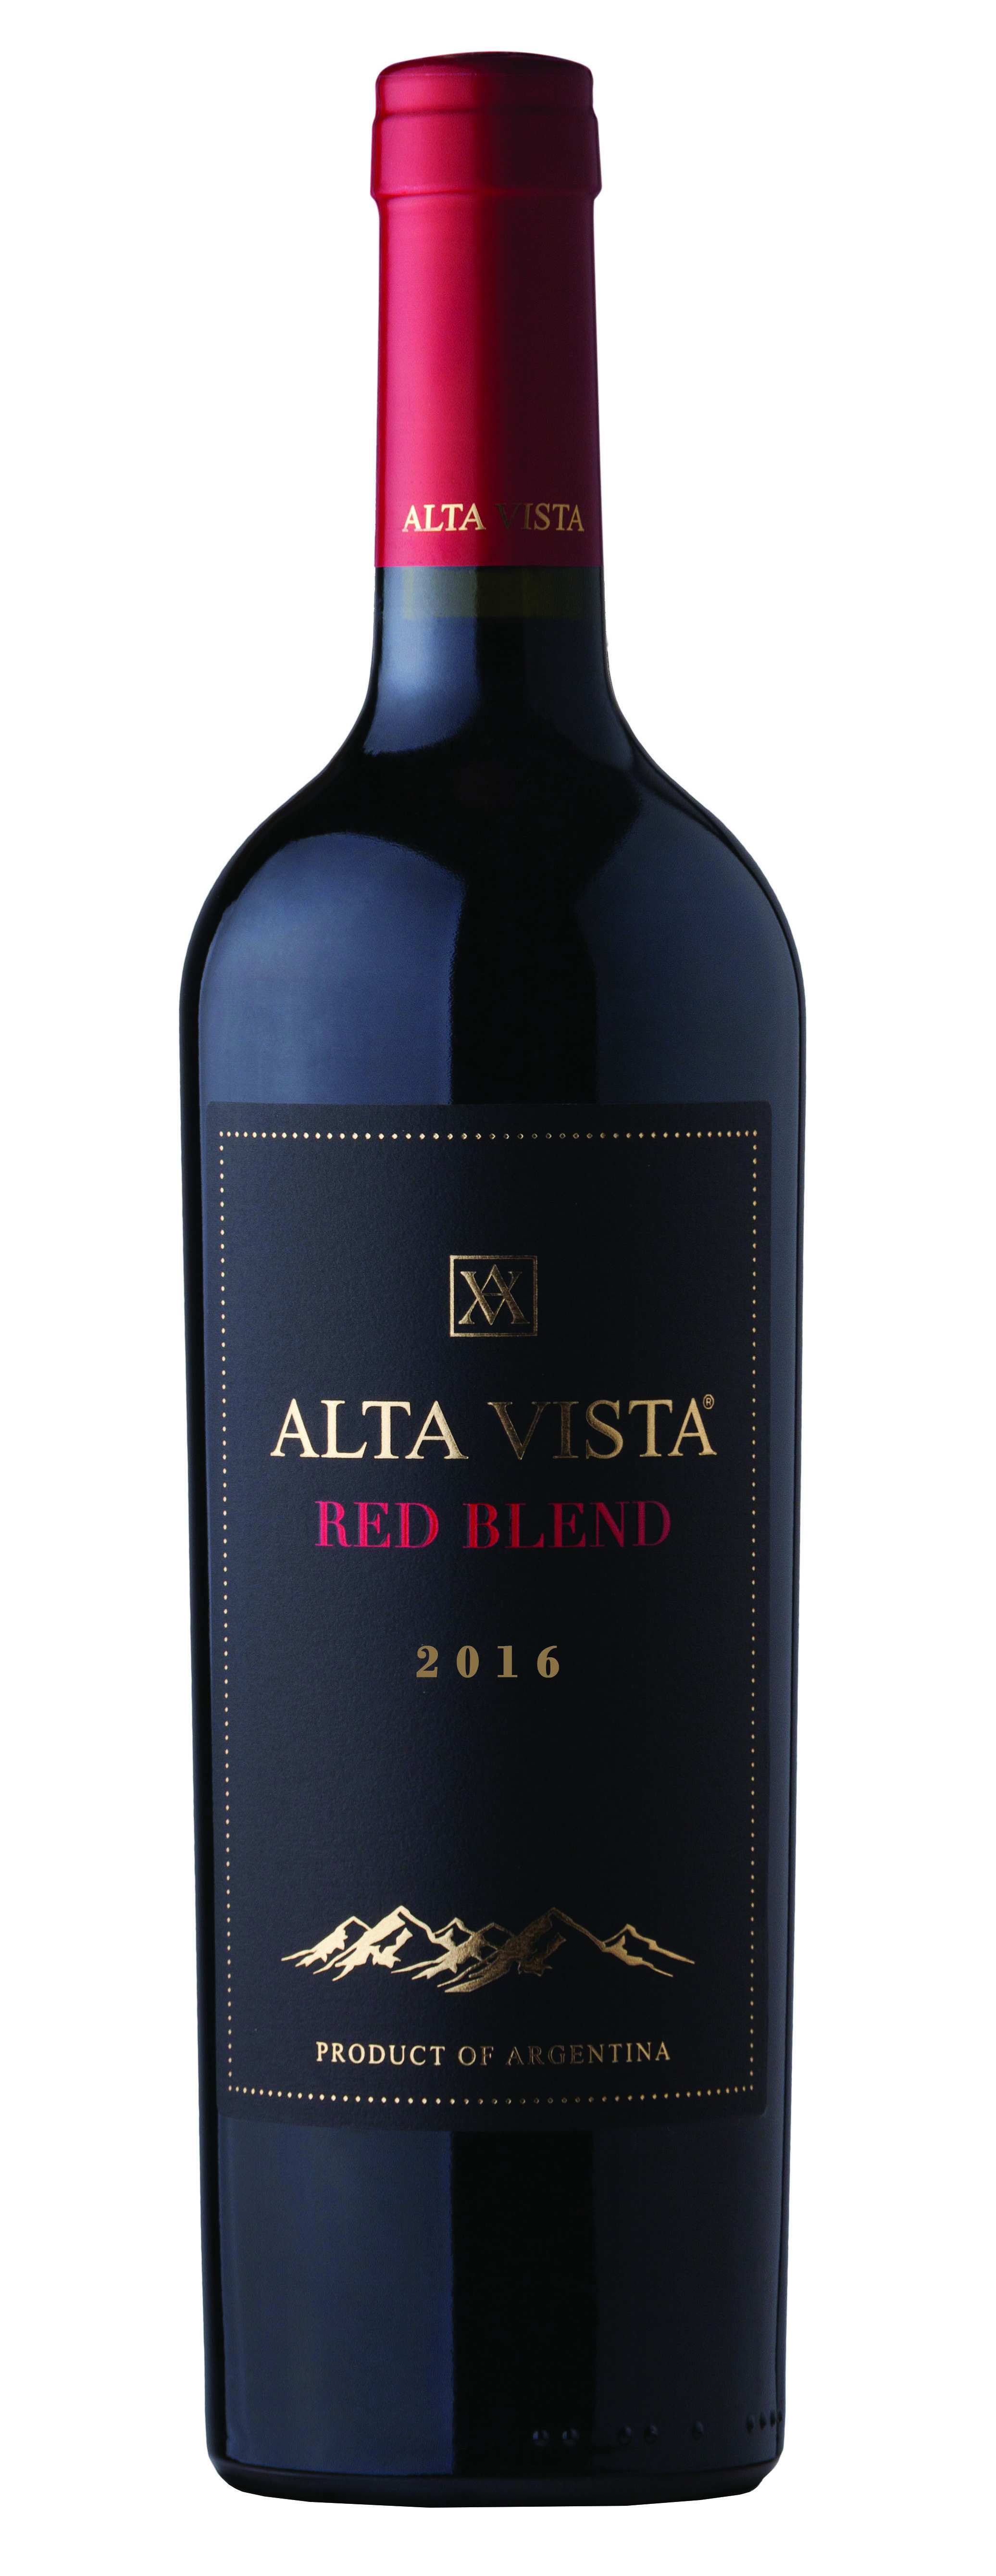 AltaVistaRedBlend2016.jpg